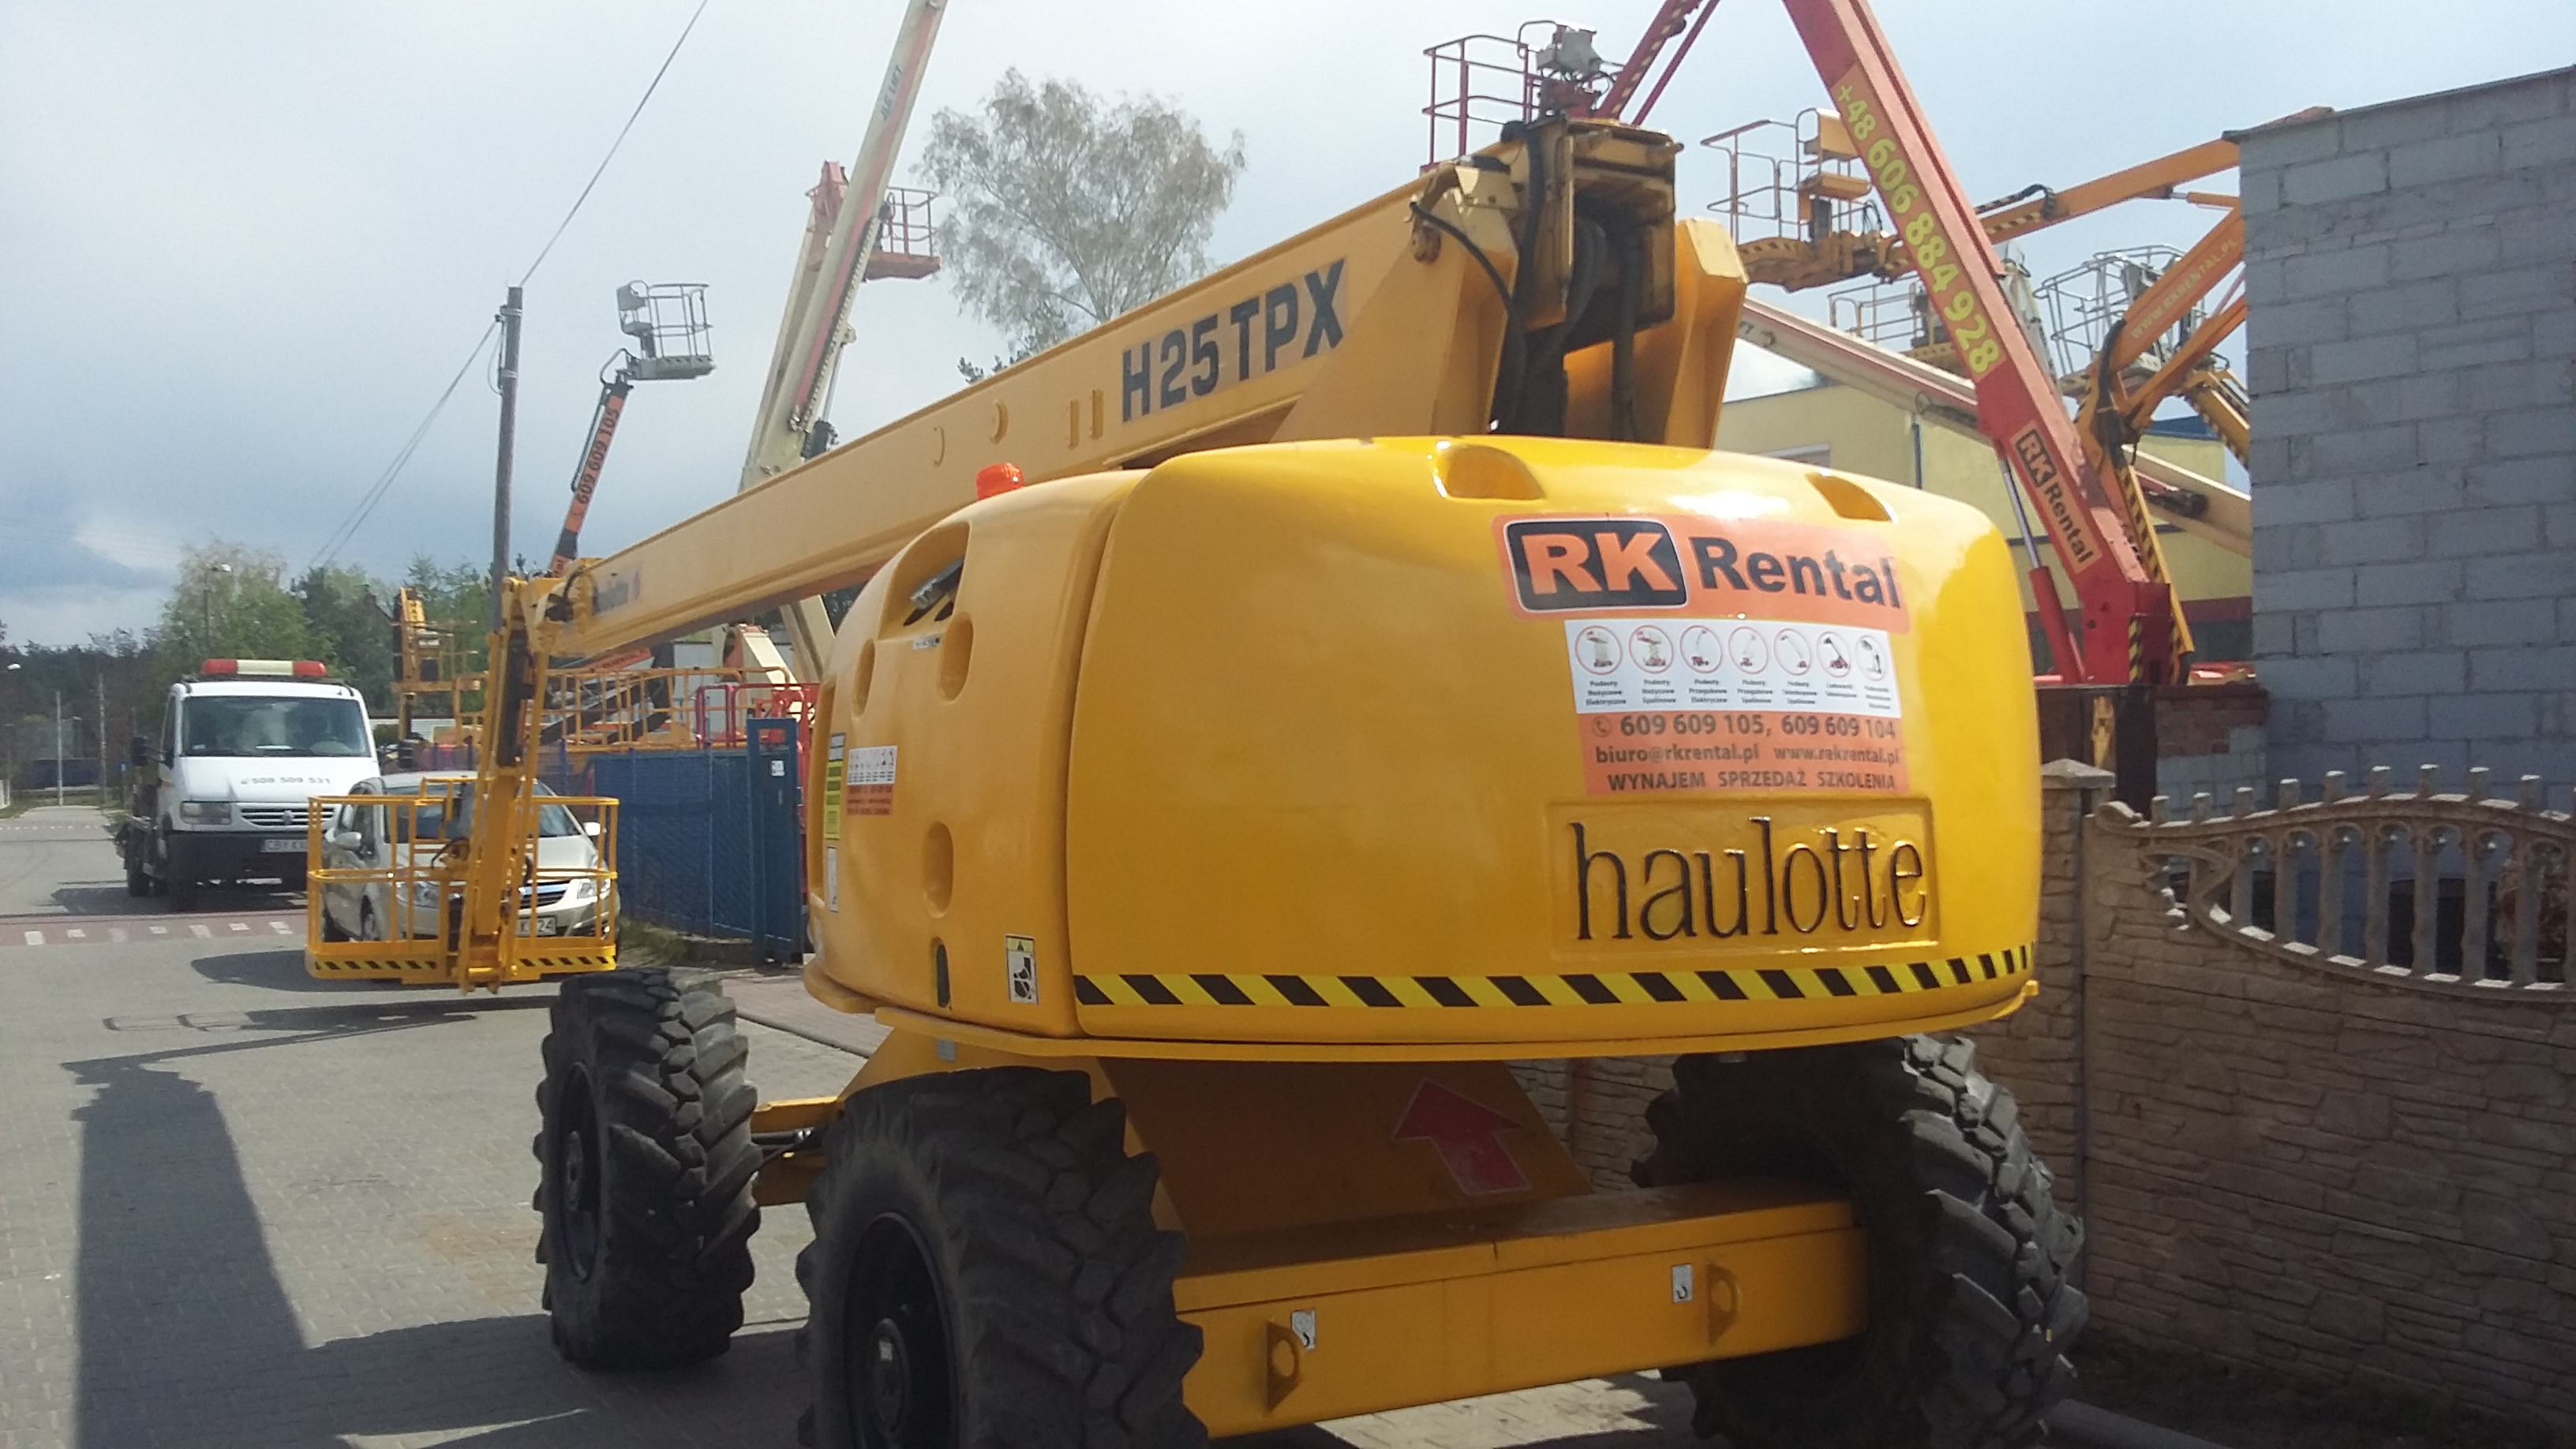 Haulotte H25 TPX